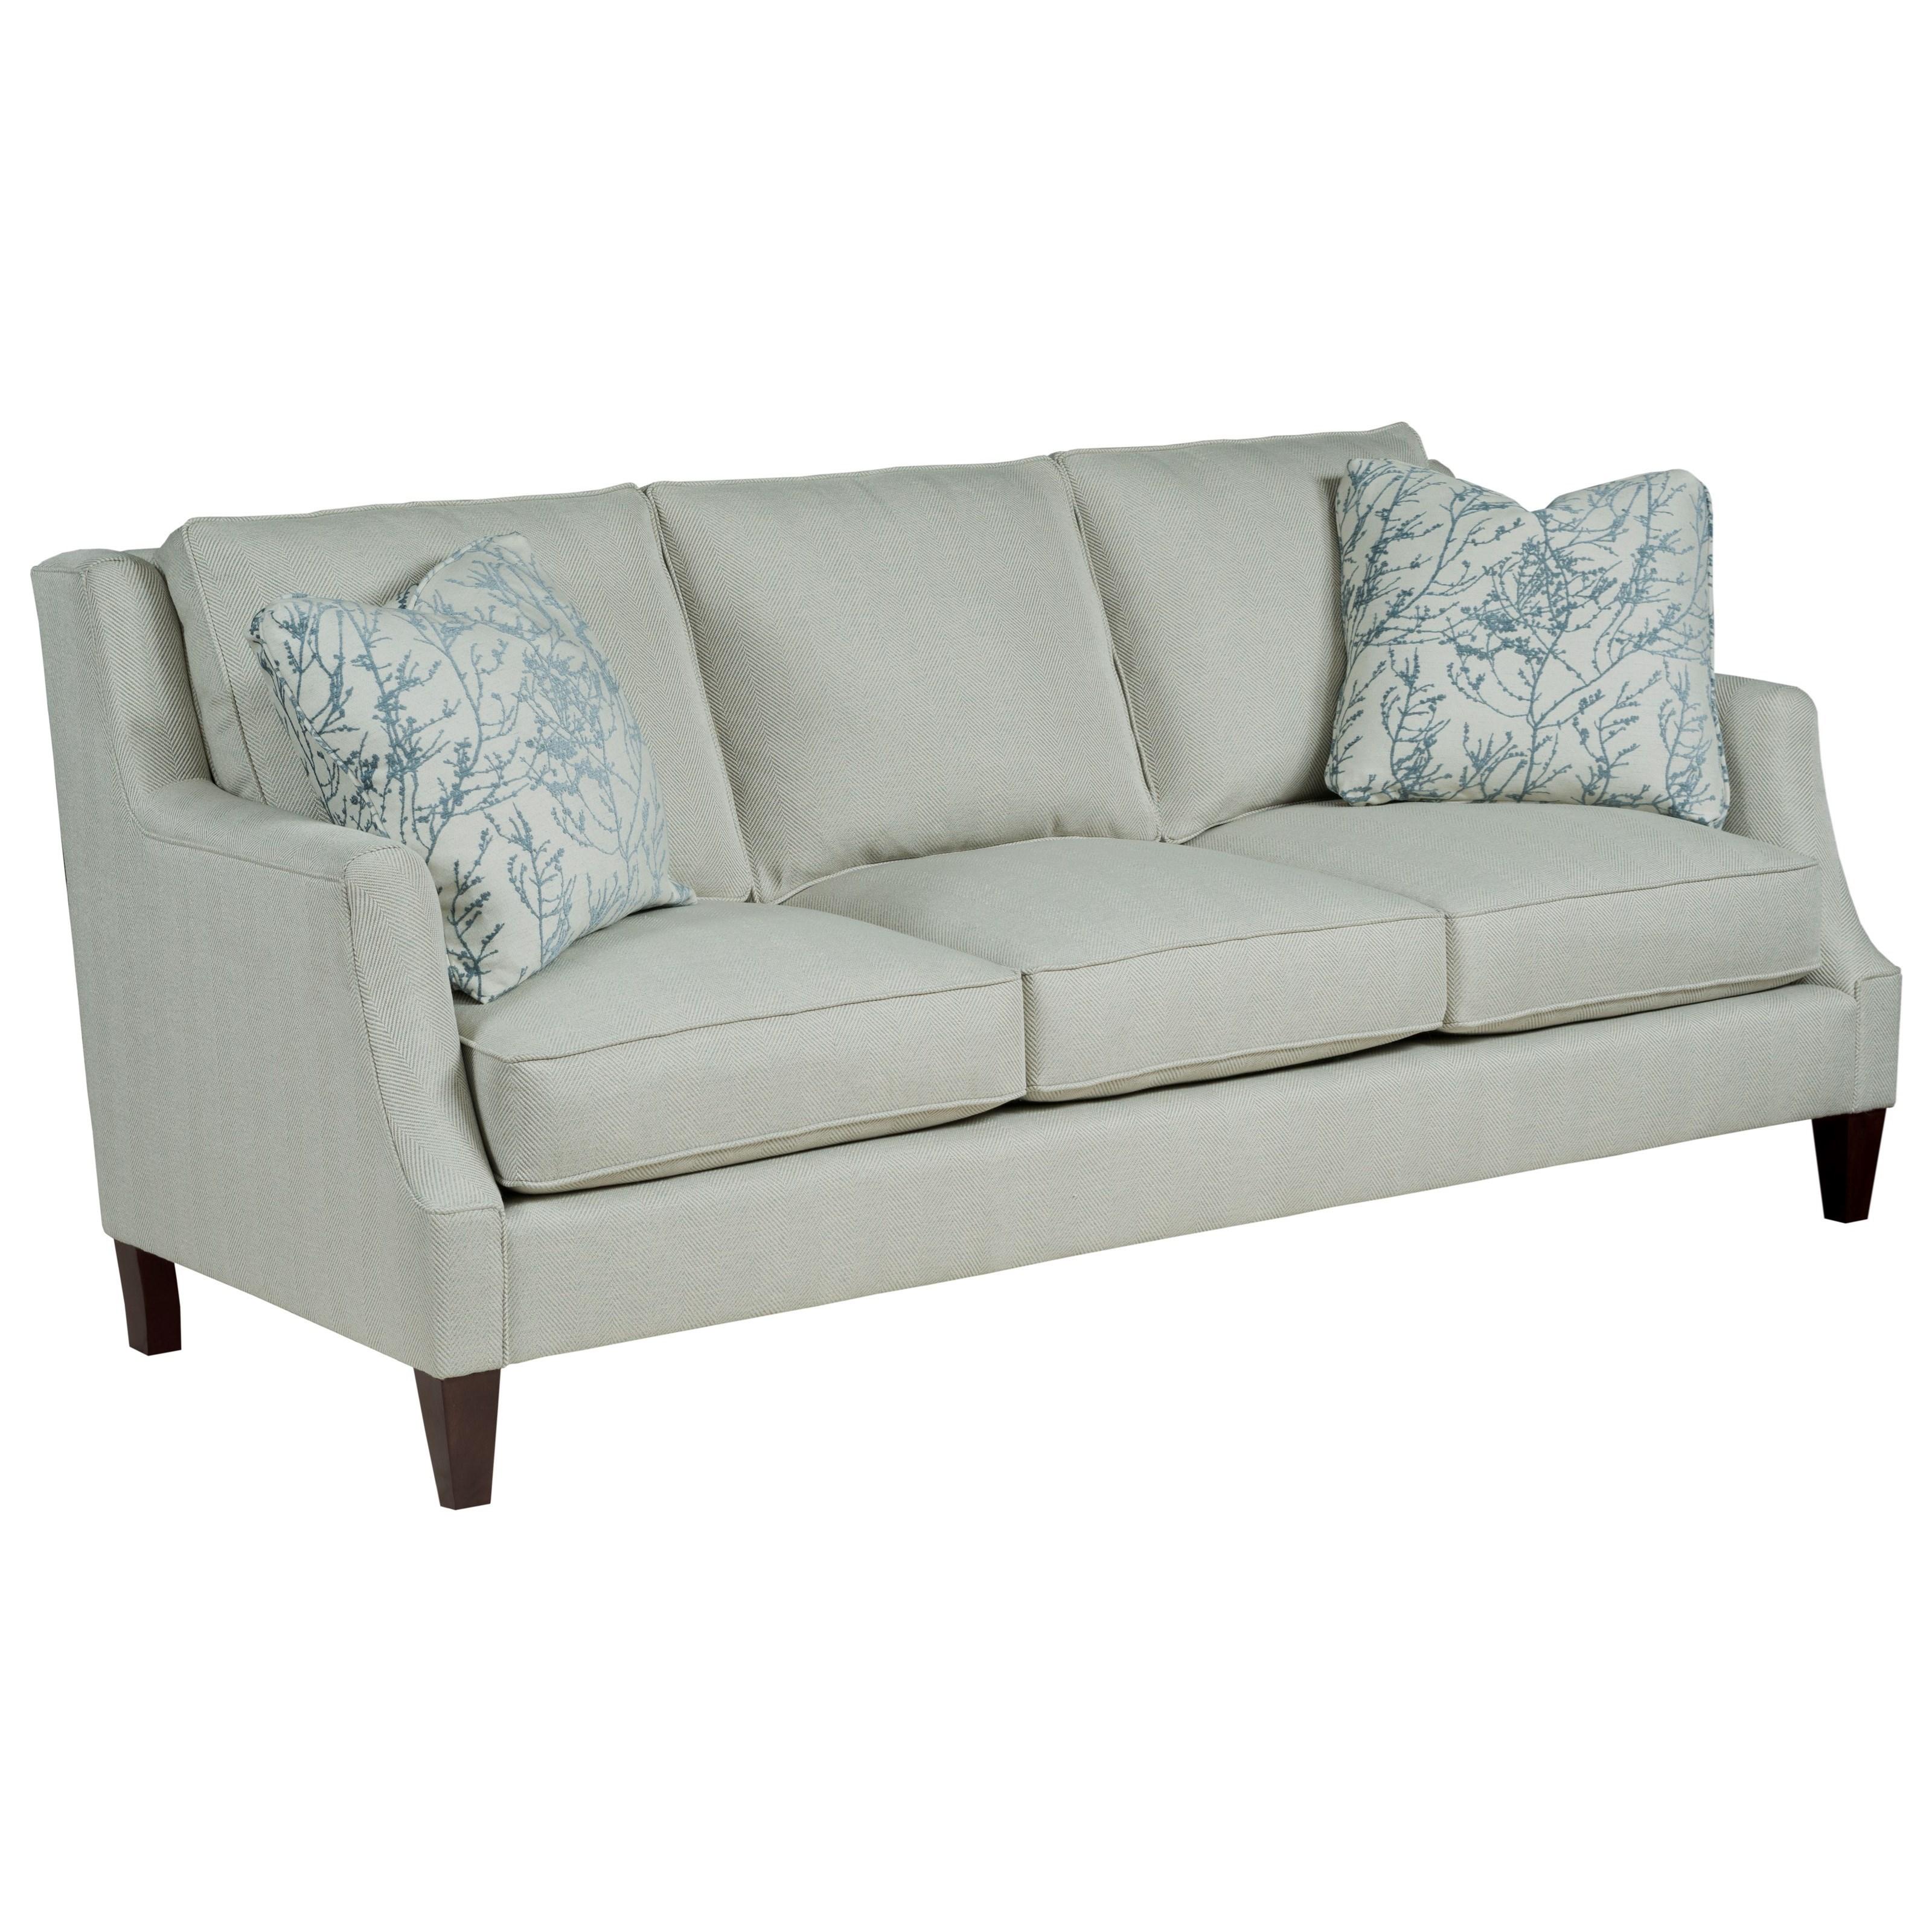 Vivian Vivian Sofa by Kincaid Furniture at Home Collections Furniture